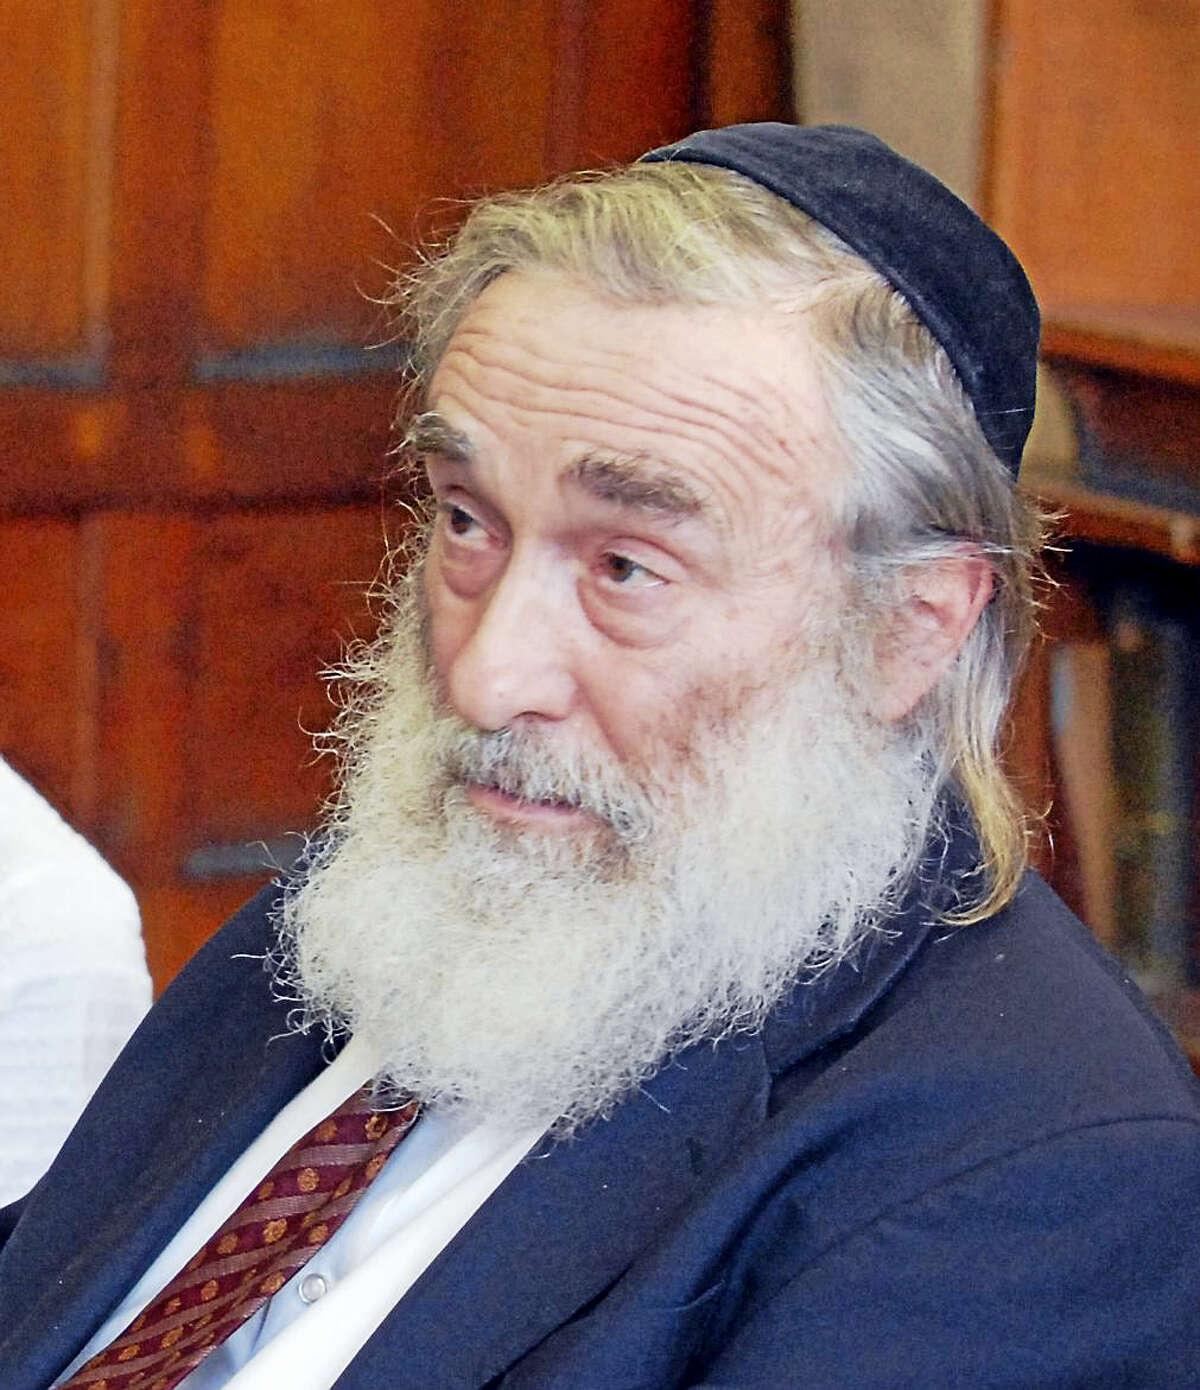 Rabbi Daniel Greer at the Yeshiva of New Haven.